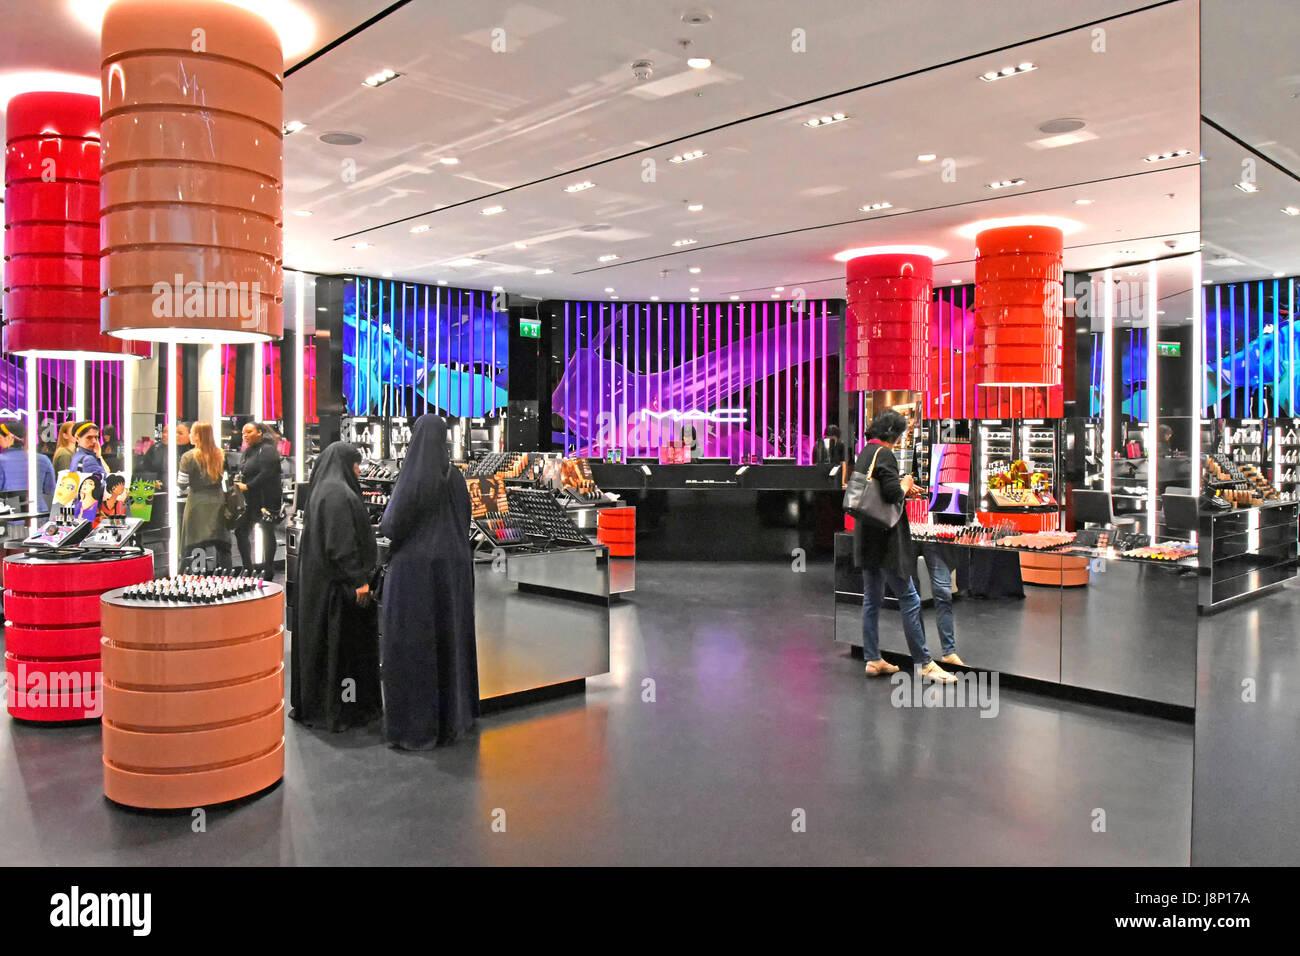 "Retail-Store MAC, Abkürzung ""Make-up Art Cosmetics"" Kosmetik Unternehmensteil der Estée Lauder, Stockbild"